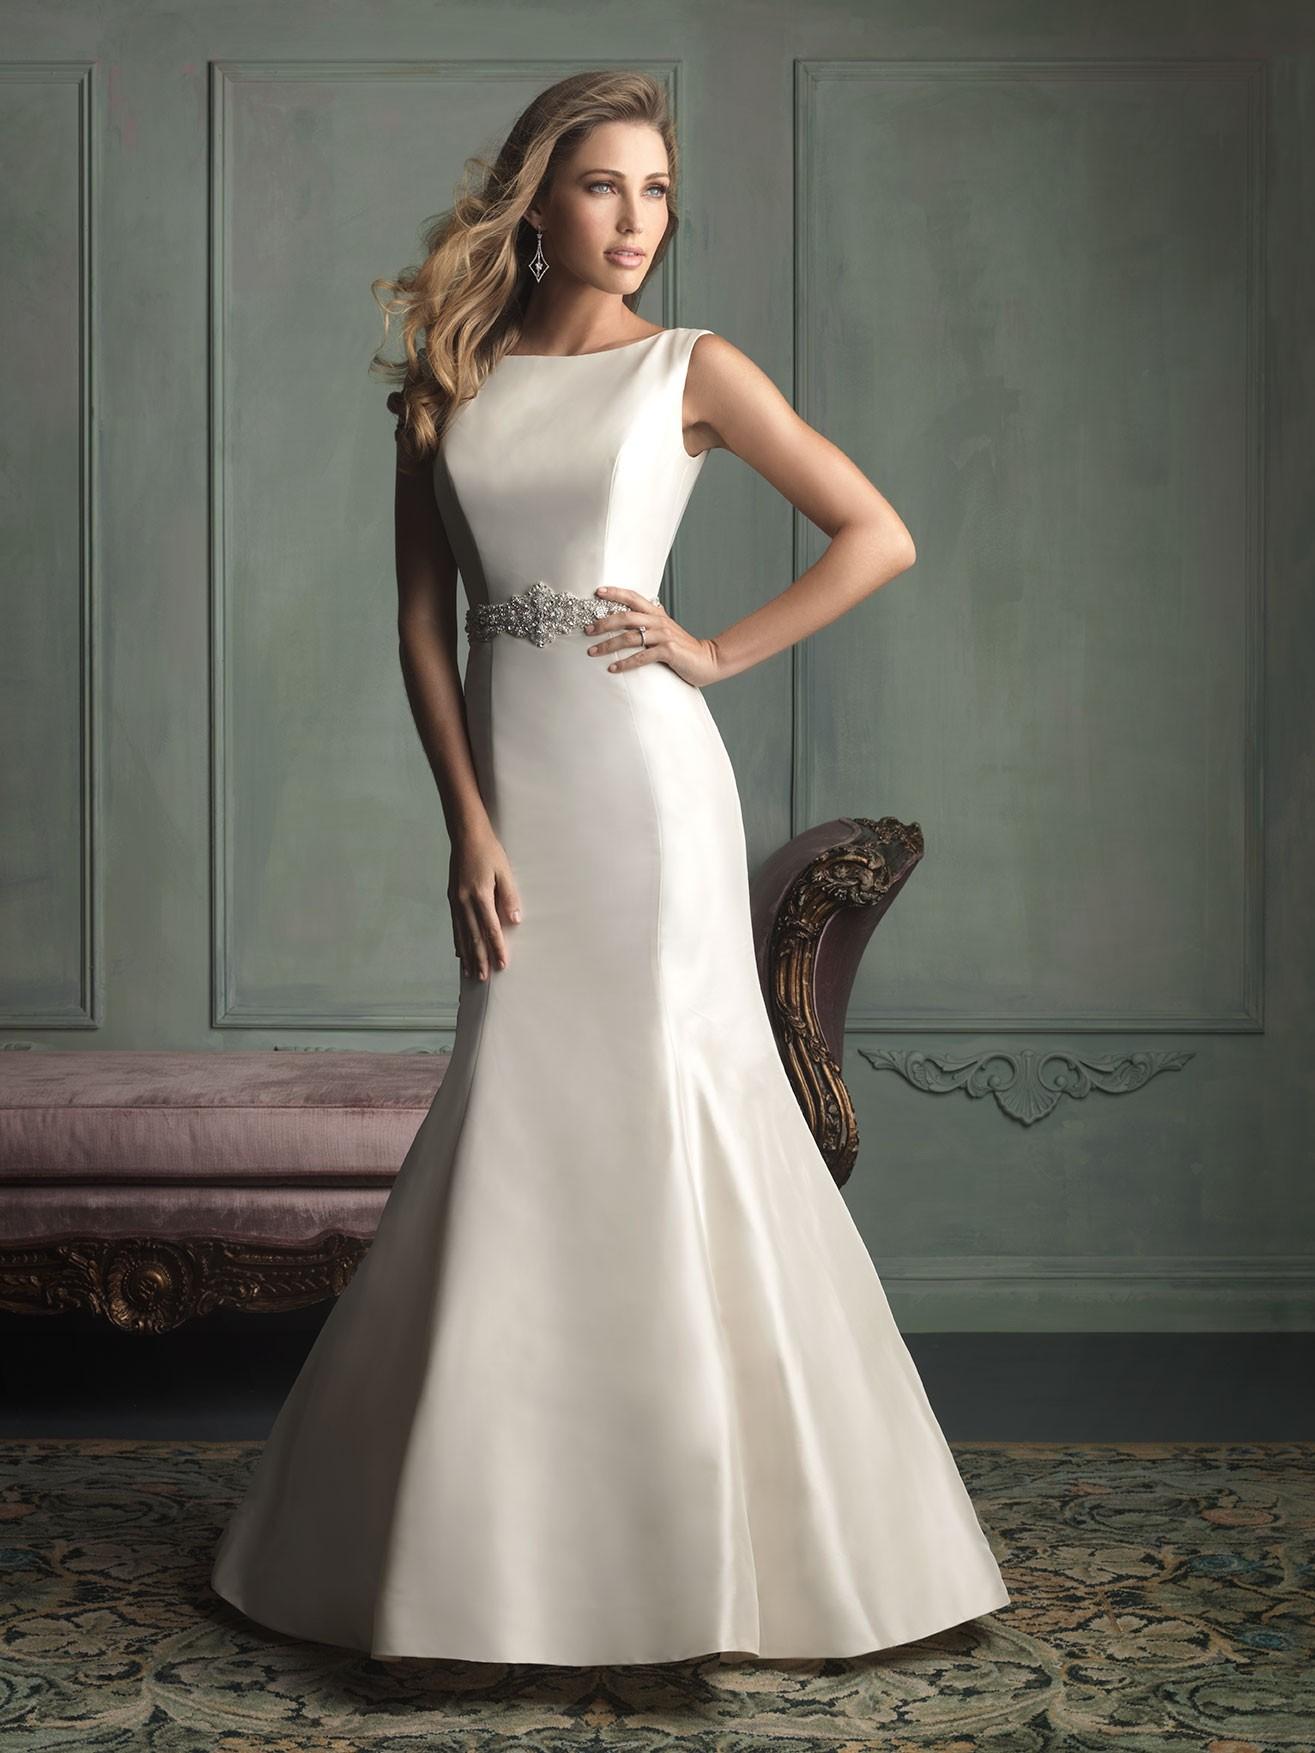 Interior Furnishing Allure Bridal 9106 Vintage Boat Neck Wedding Dress Crazy